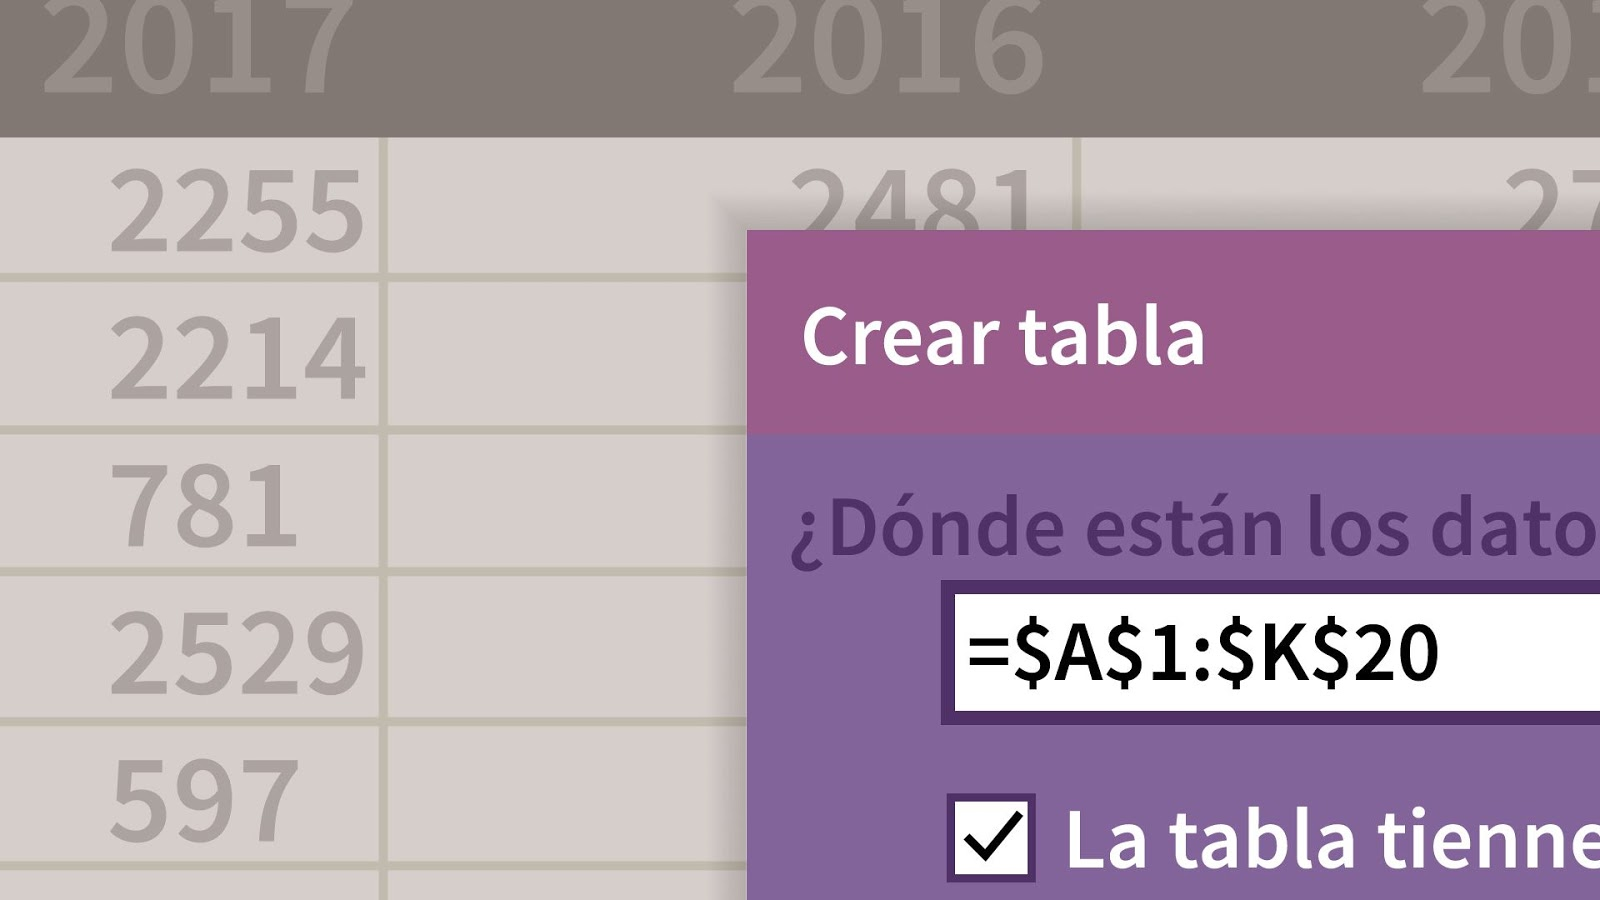 Excel 2016 Obtener y transformar (Power Query) (LinkedIn Learning)